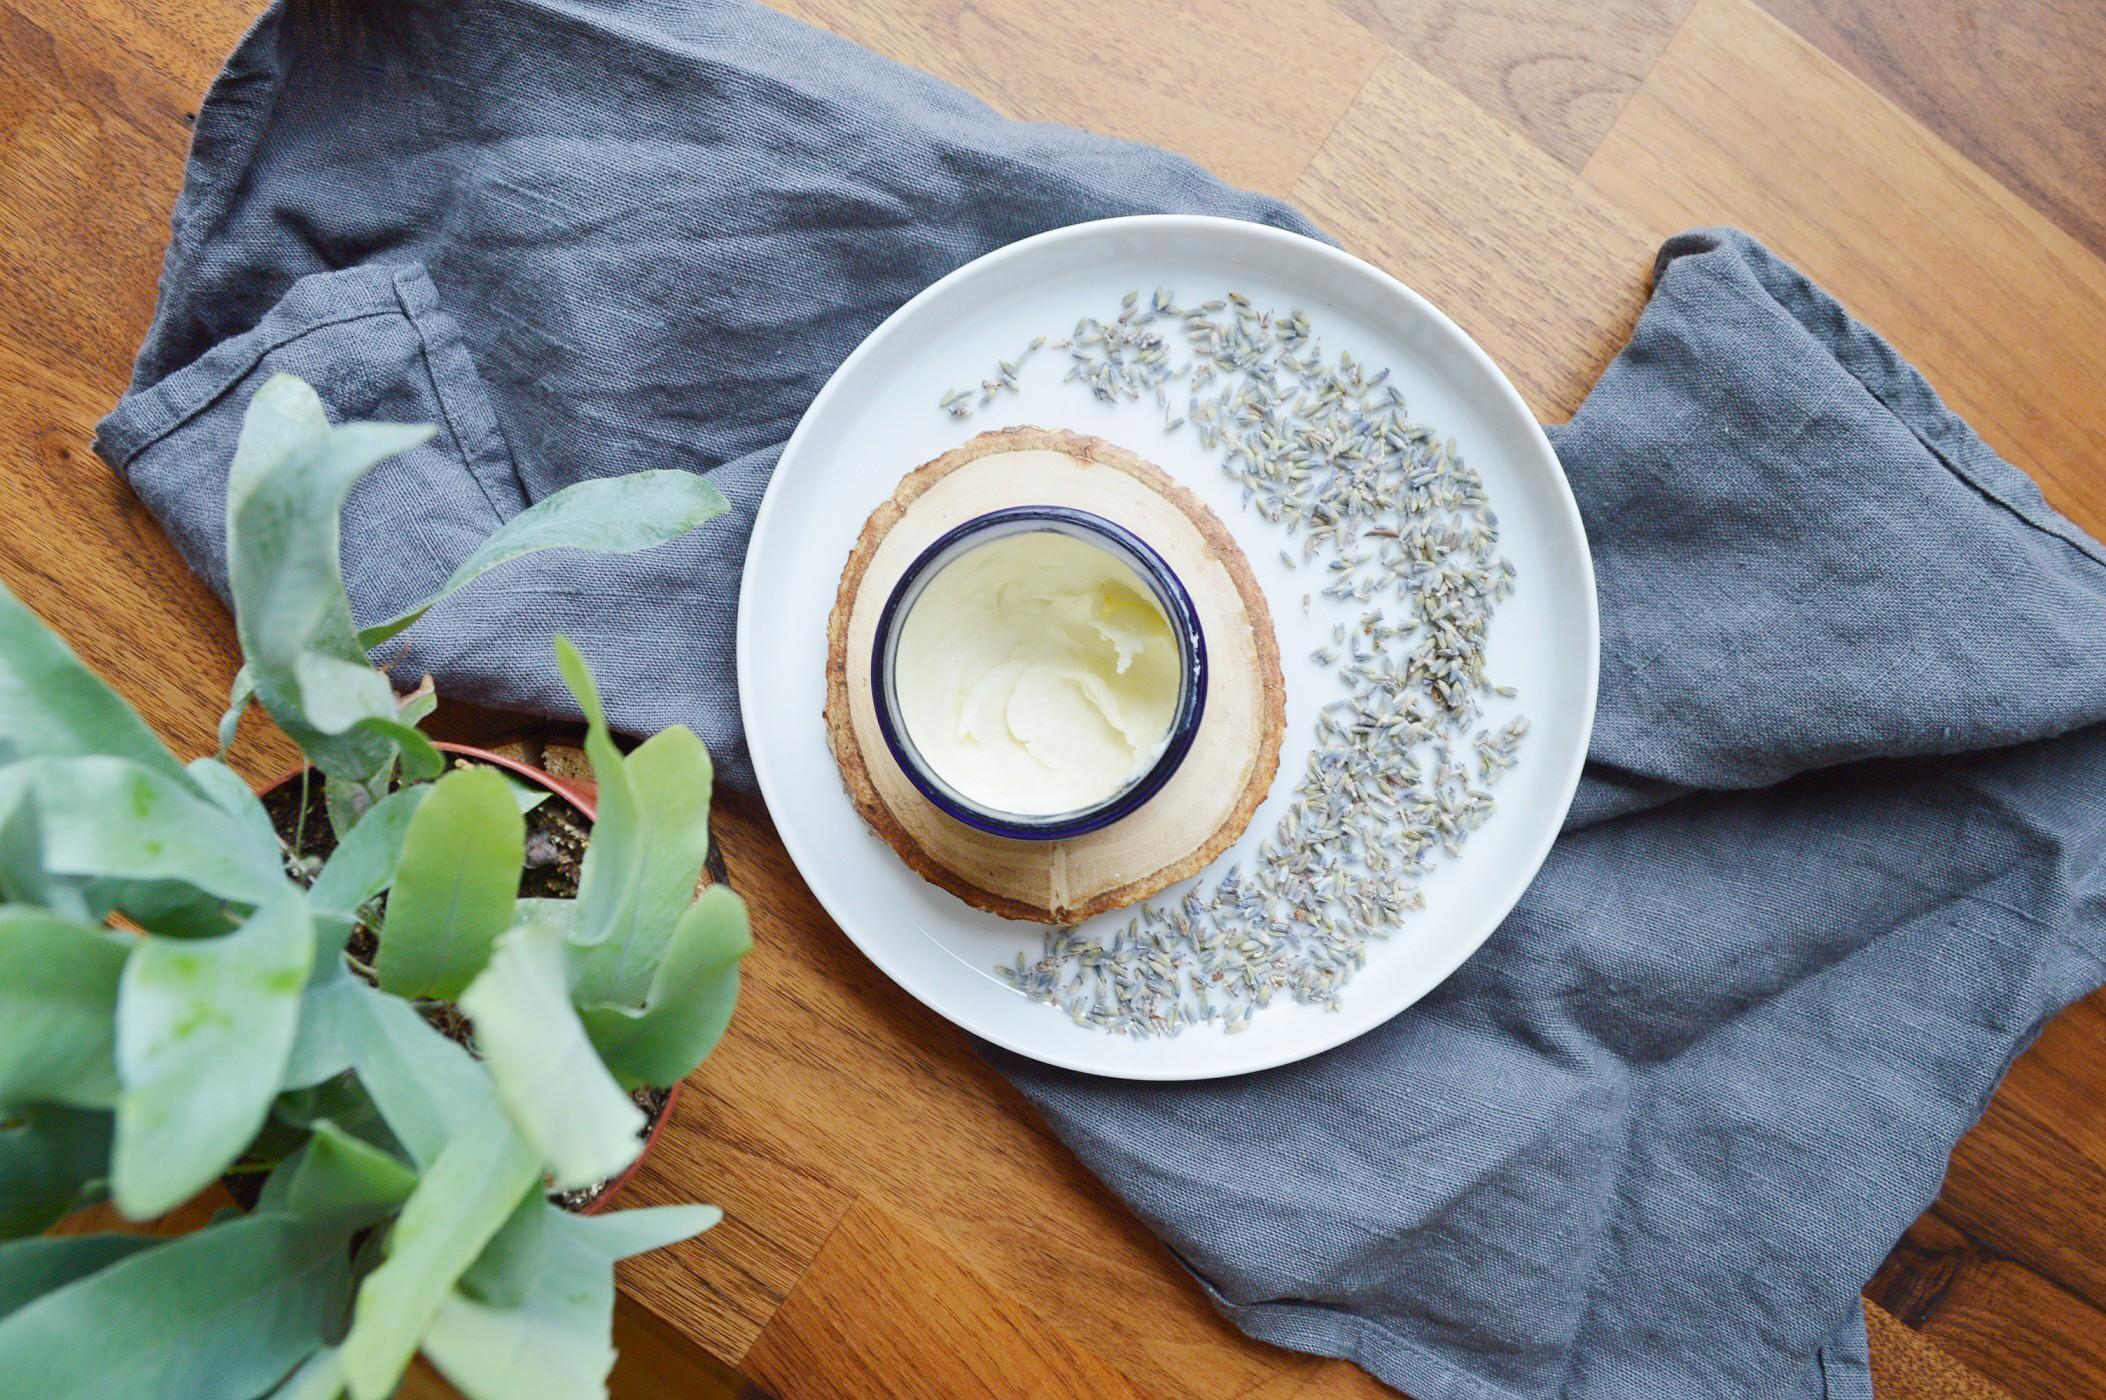 Urban Alchemist Lavender Body Butter Review